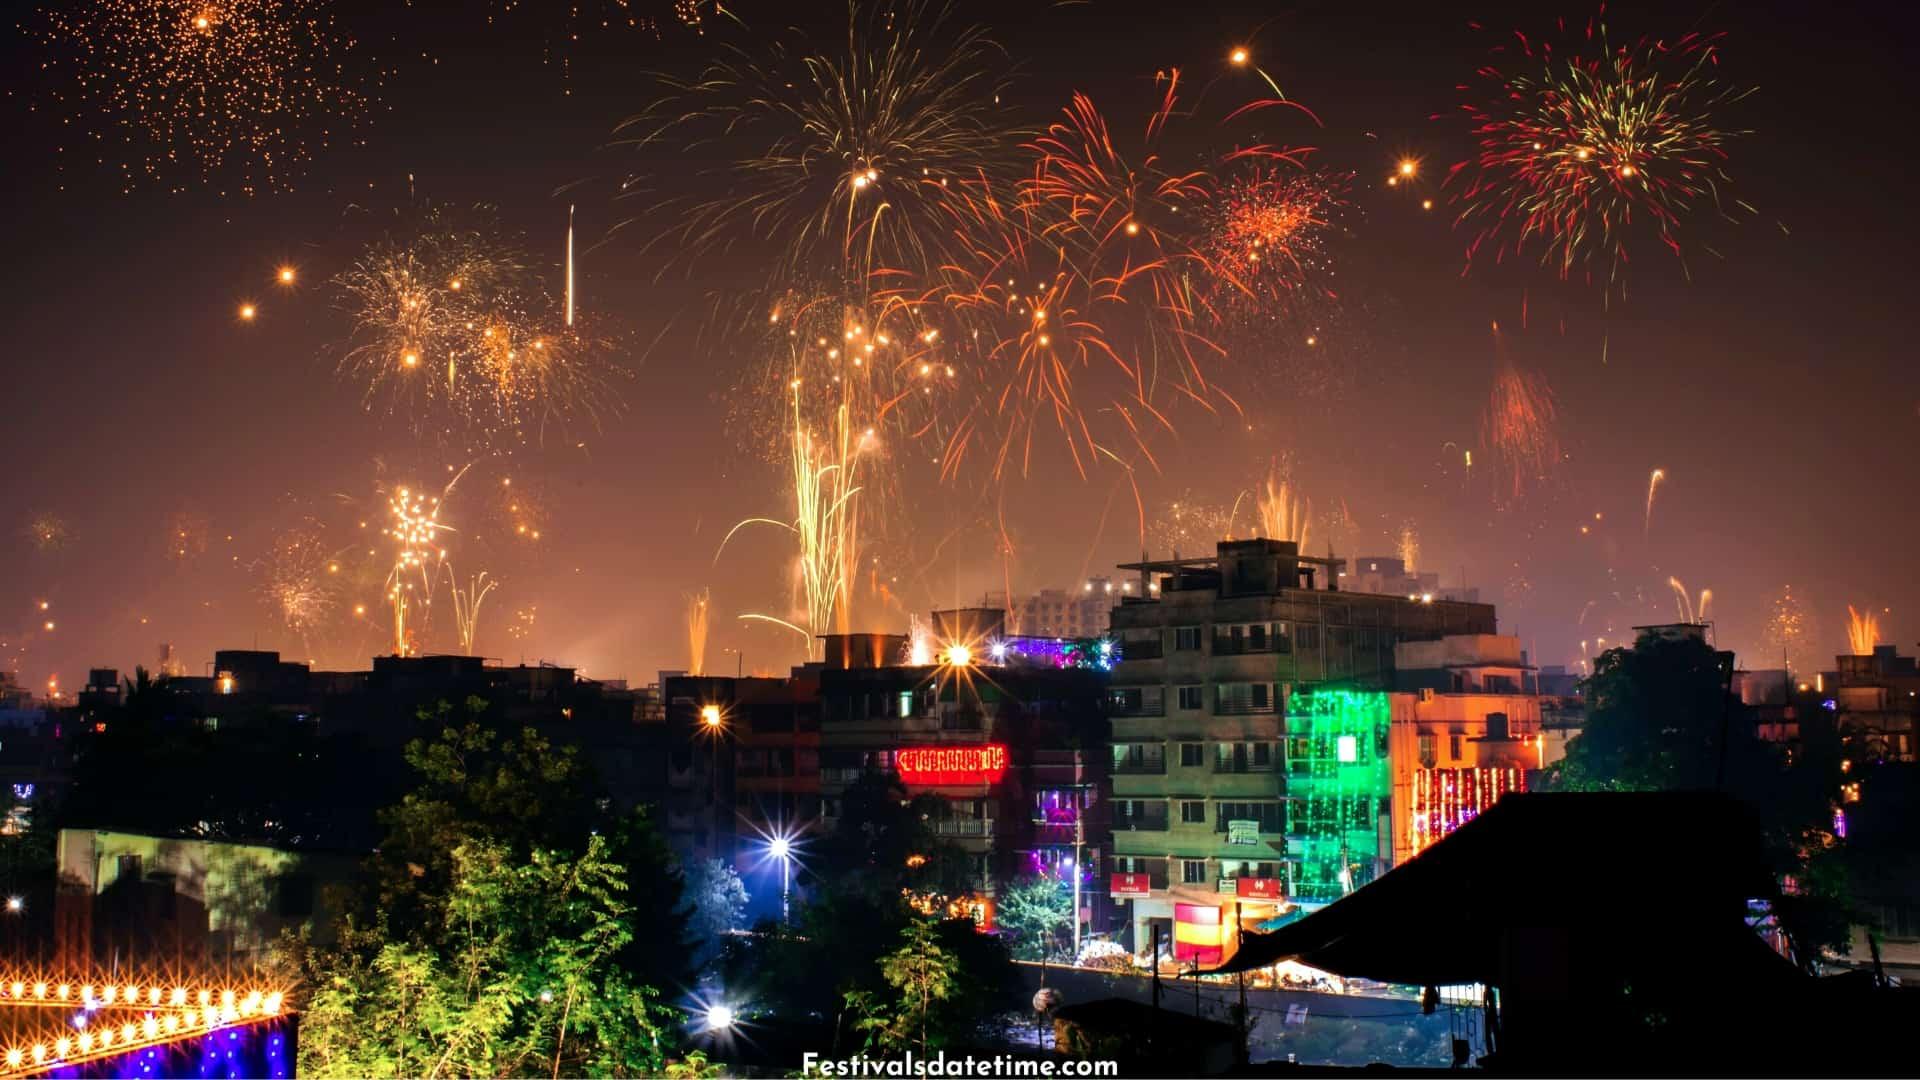 diwali_background_hd_for_editing